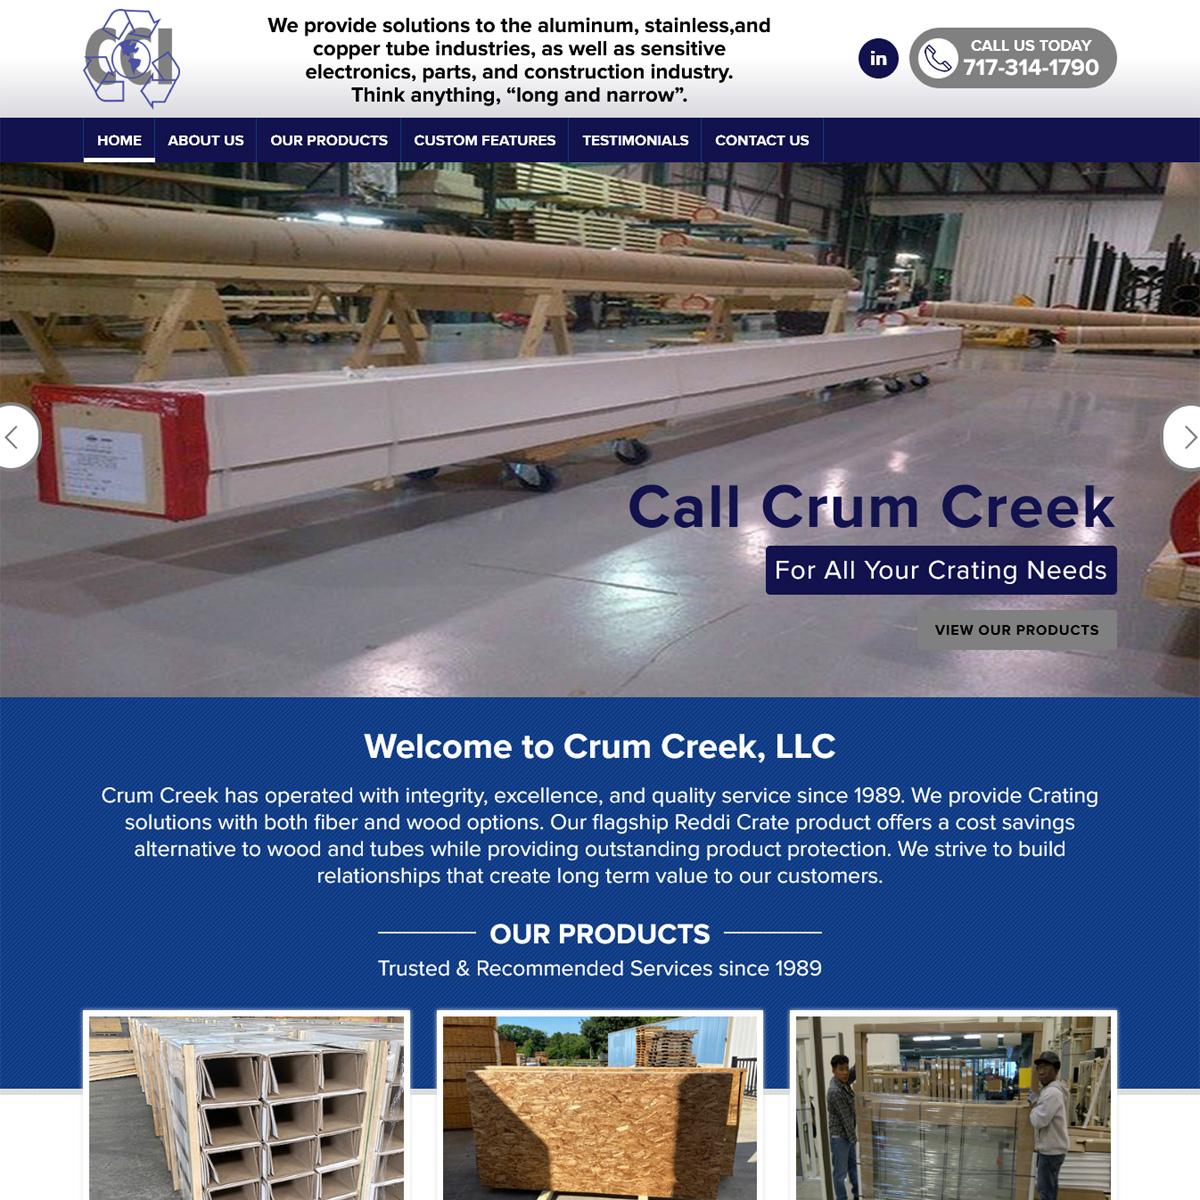 Crum Creek Website Design